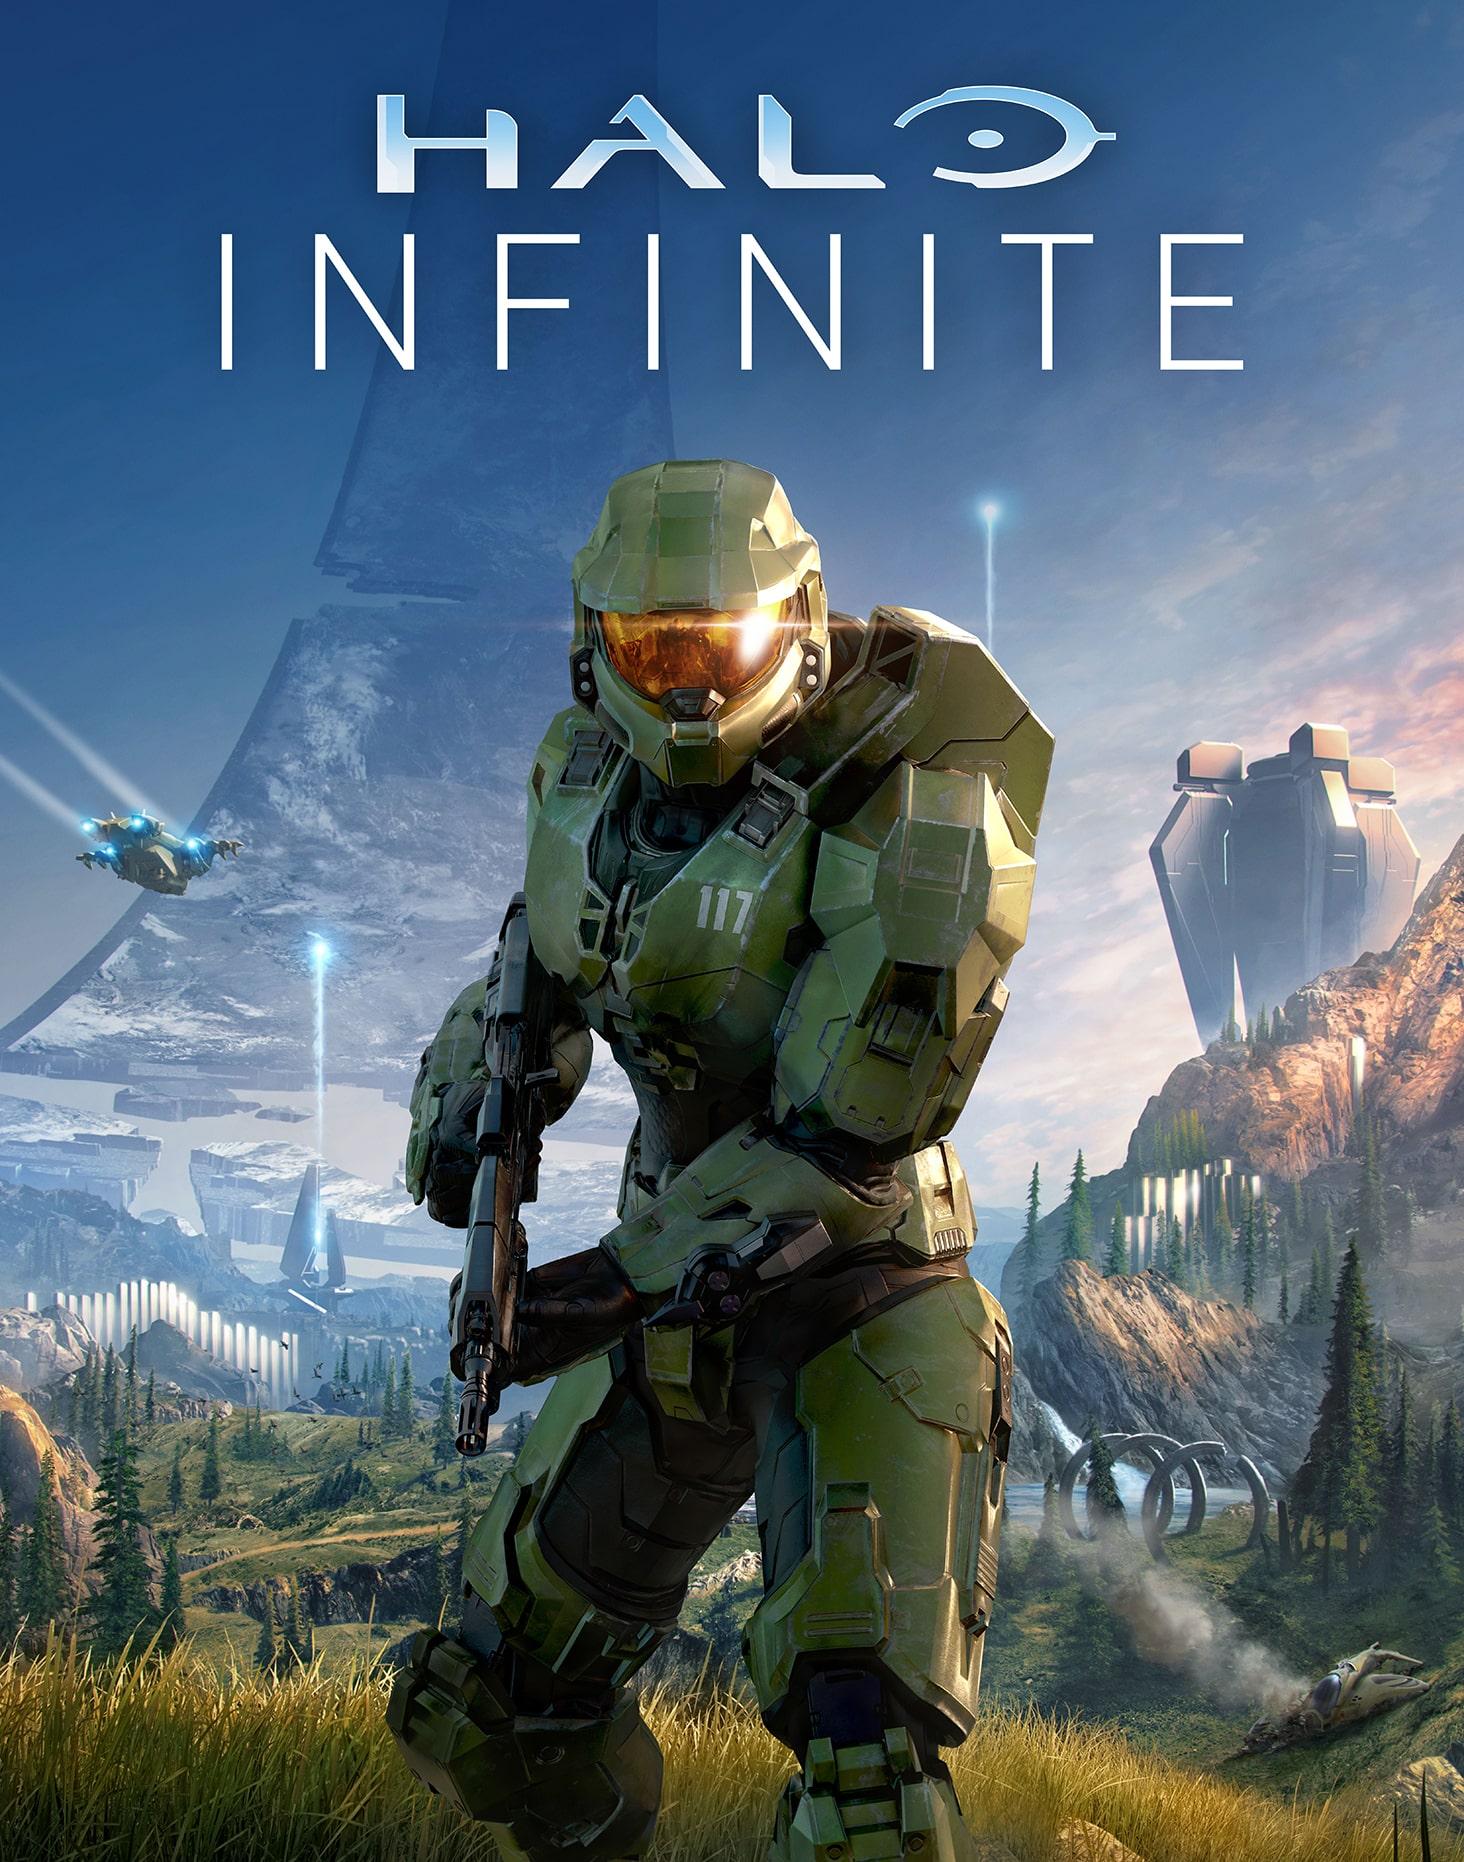 Halo Infinite . Halo Infinite, svelate la key e box art - GamingTalker